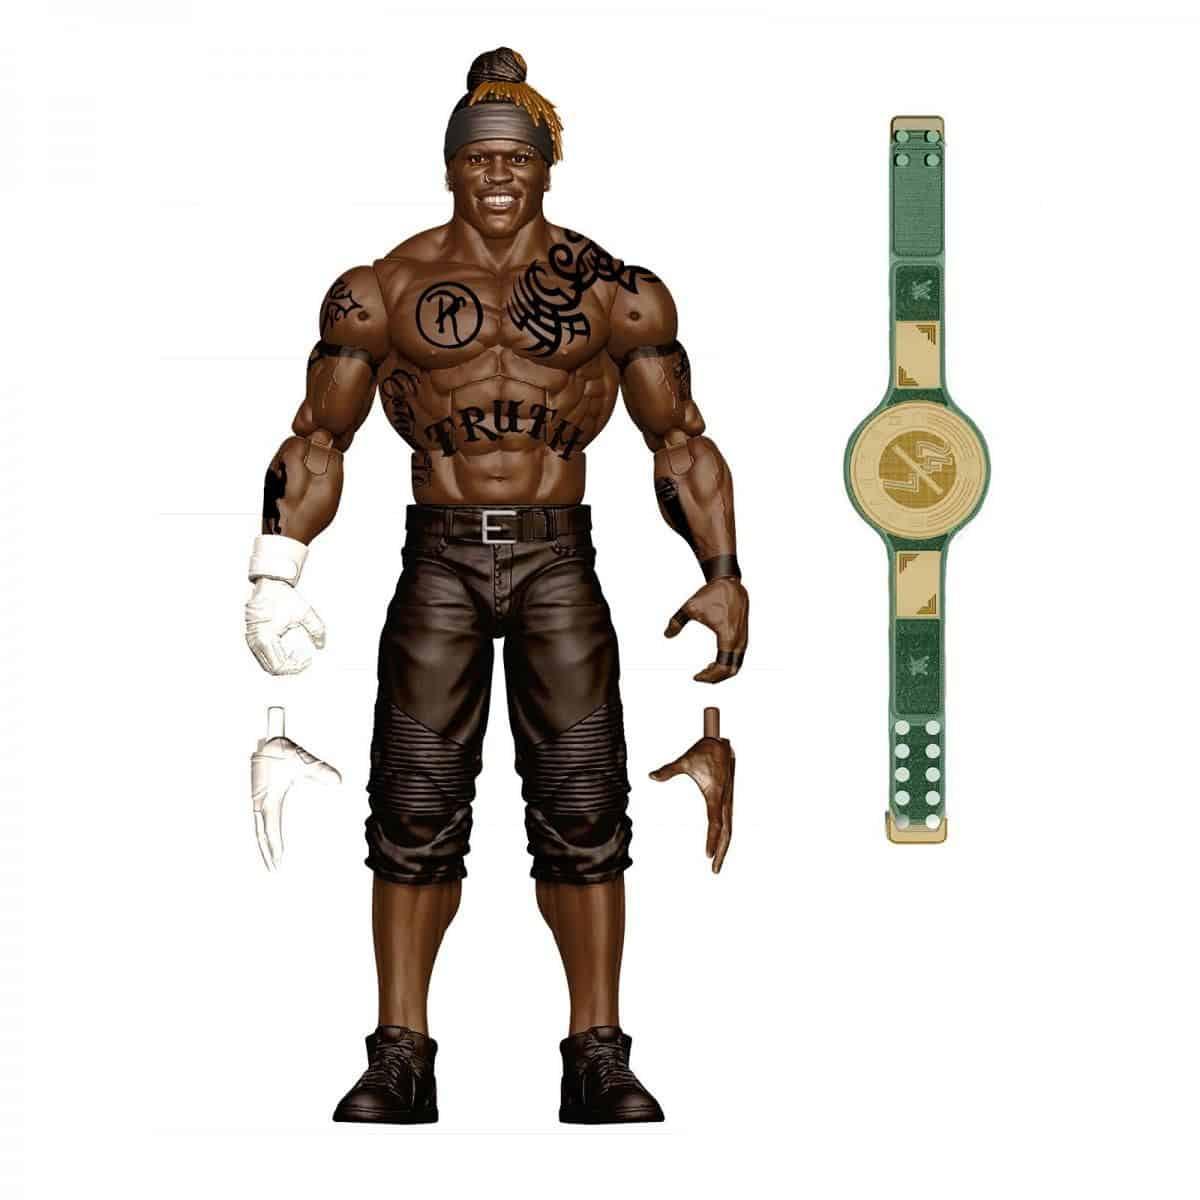 WWE Mattel 2012 Basic Superstars John Cena Figurine #15